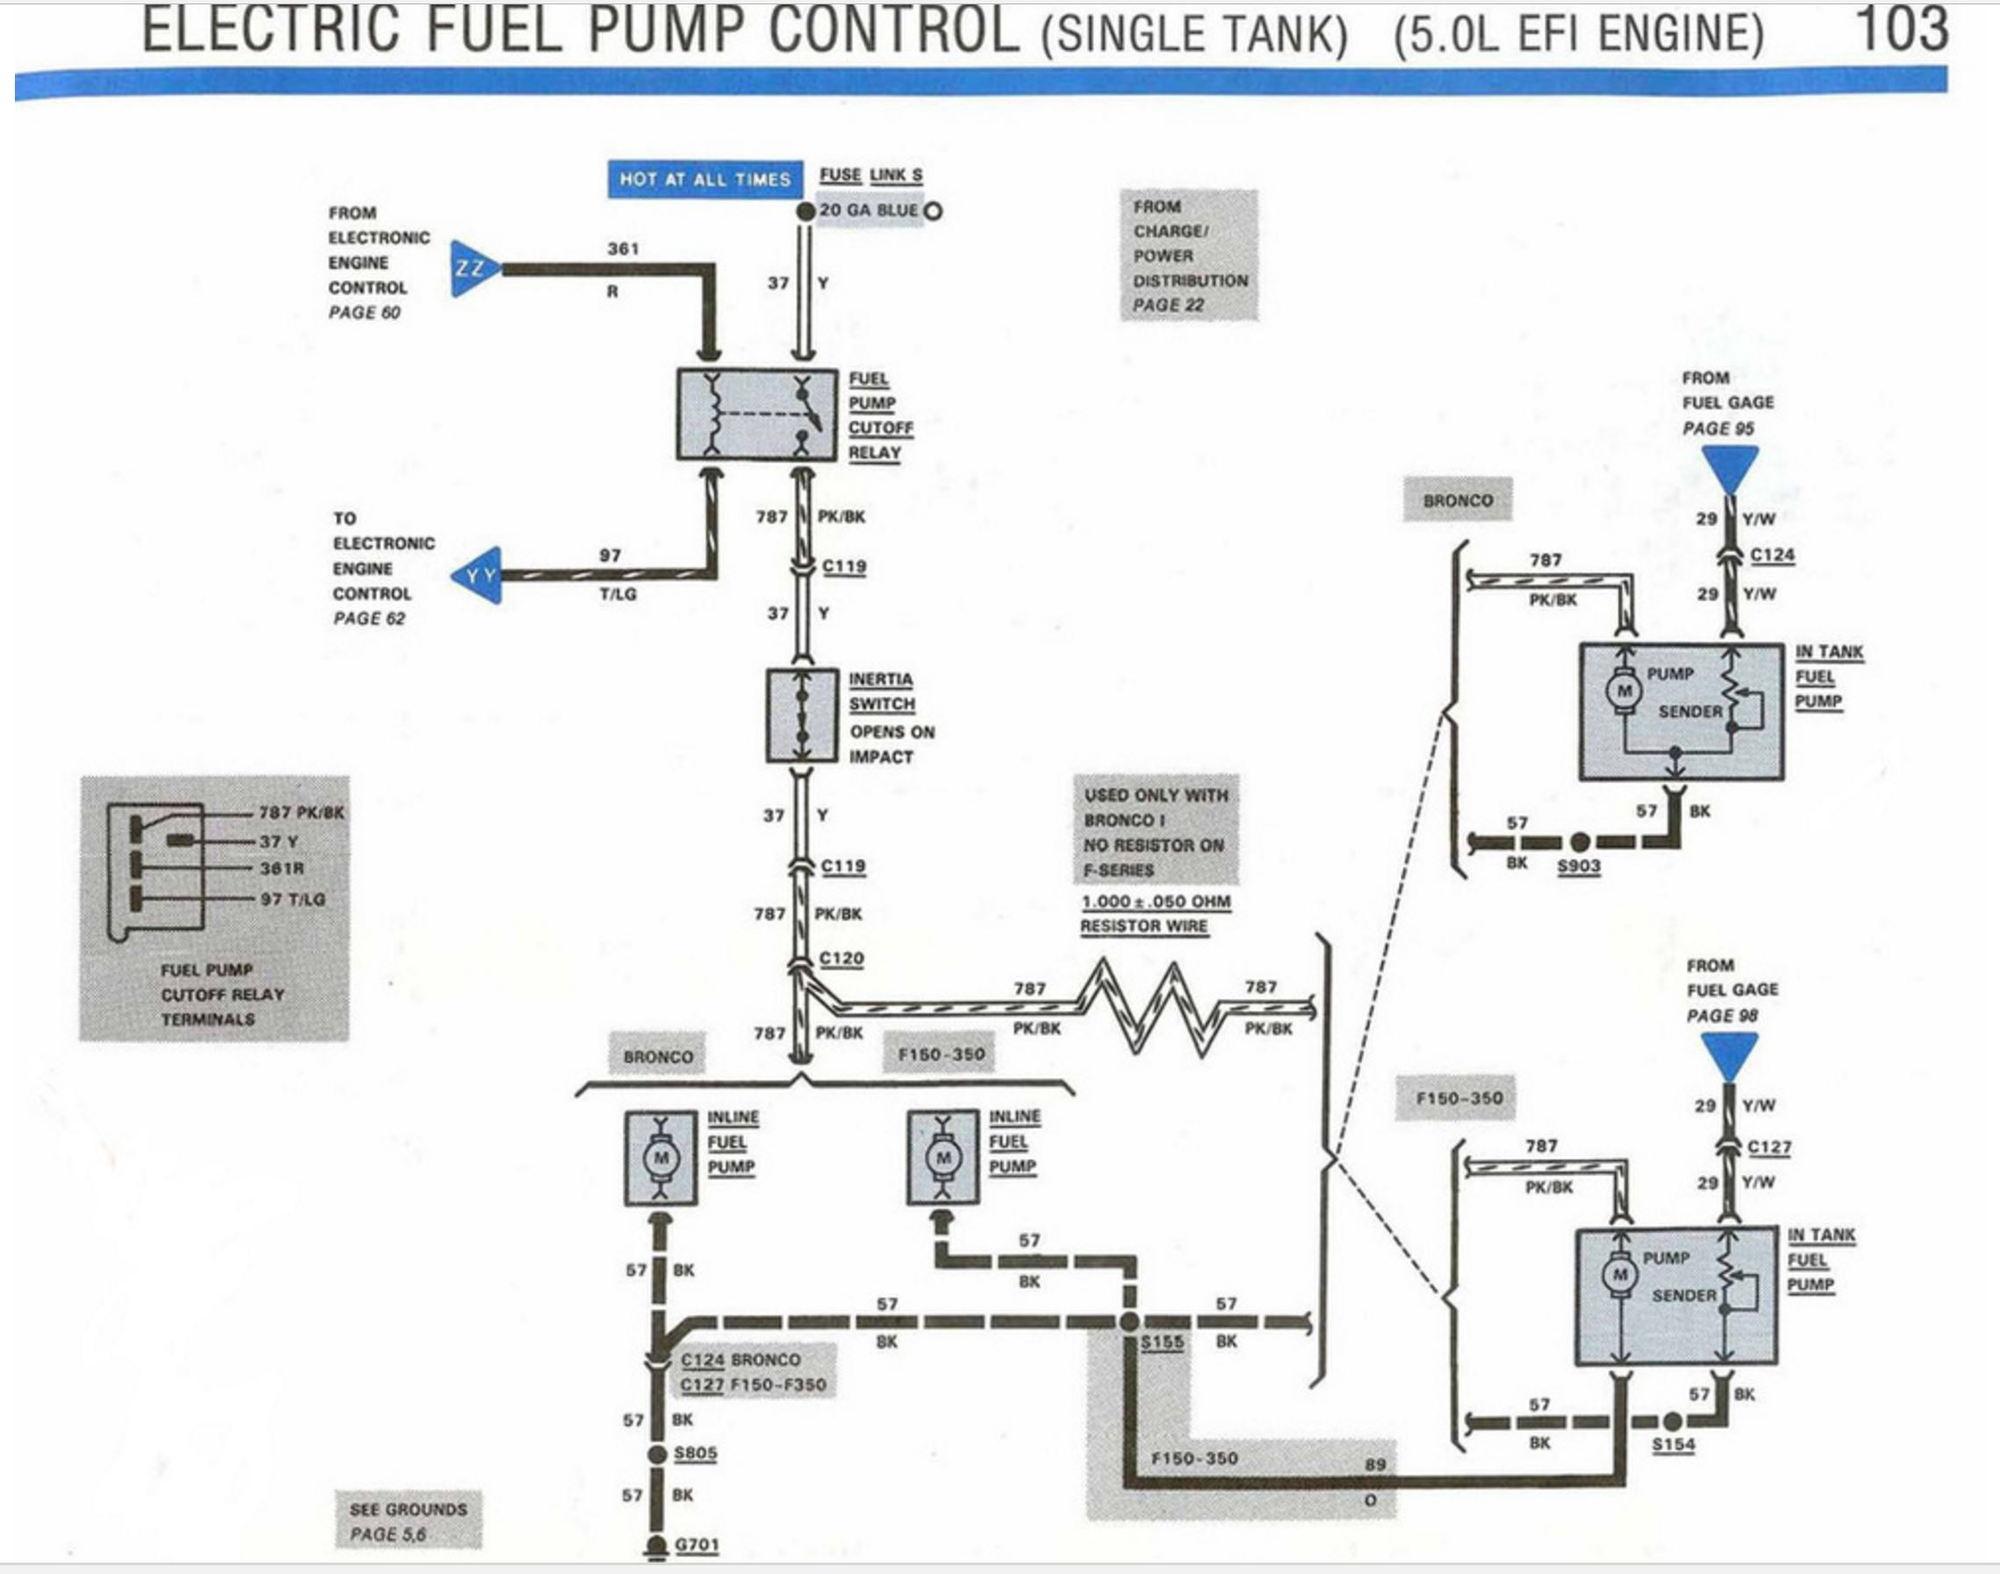 where is fuel pump test terminal